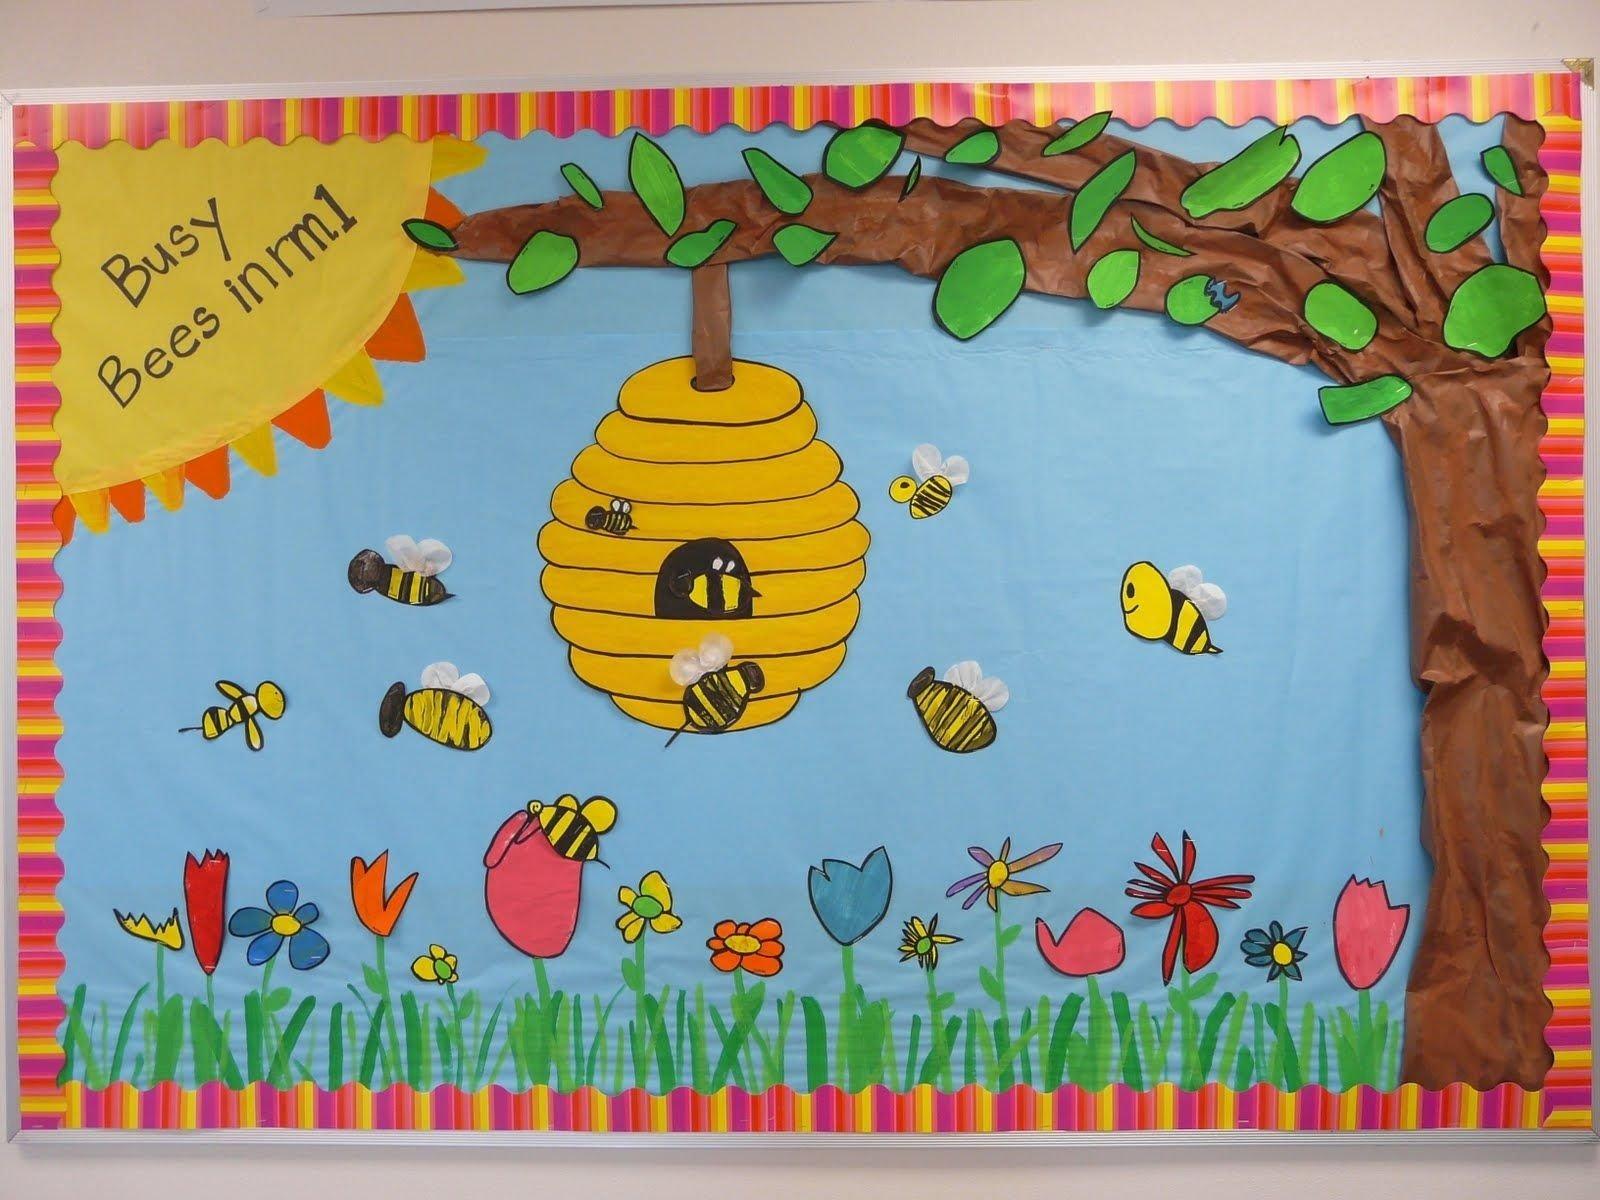 10 Trendy Spring Preschool Bulletin Board Ideas spring bulletin board ideas postedbulletin boards at 1004 am 3 2020